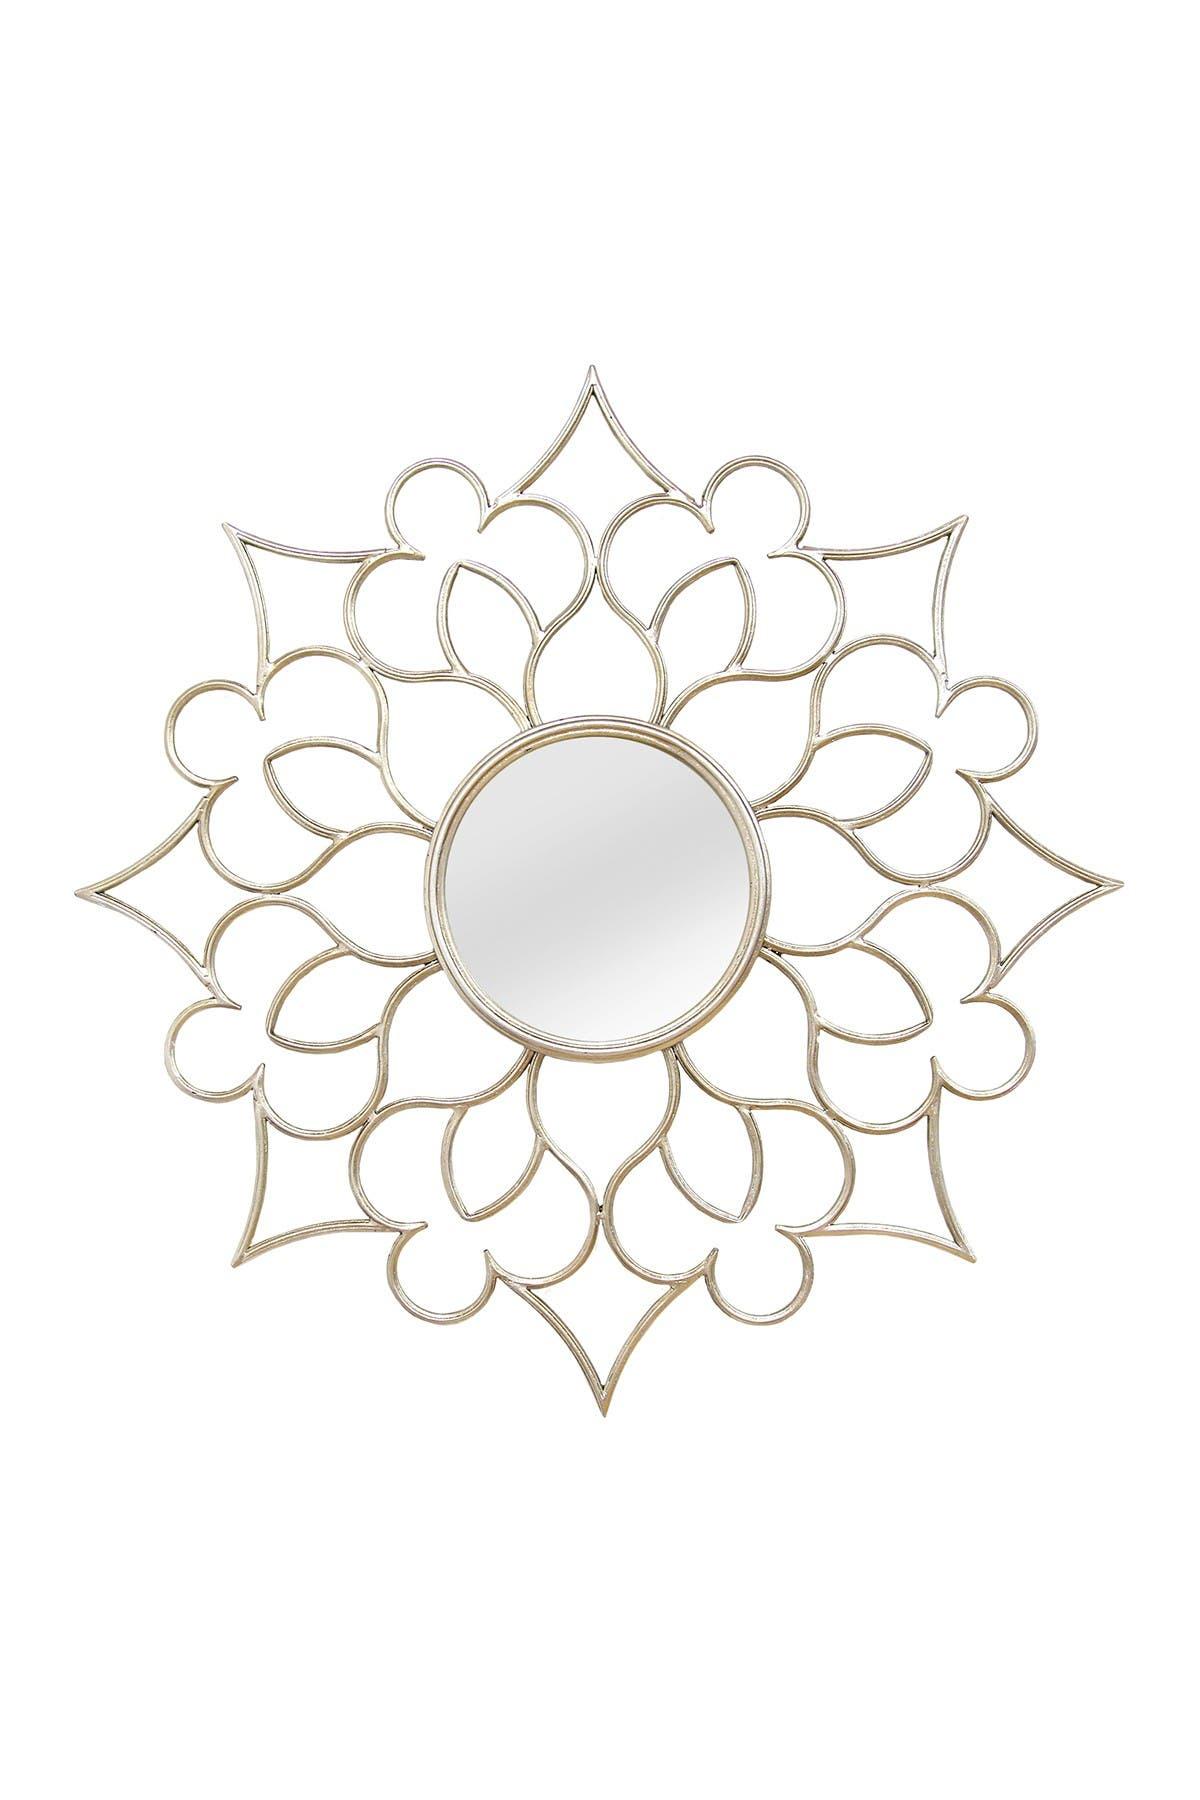 Image of Stratton Home Silver Francesca Wall Mirror